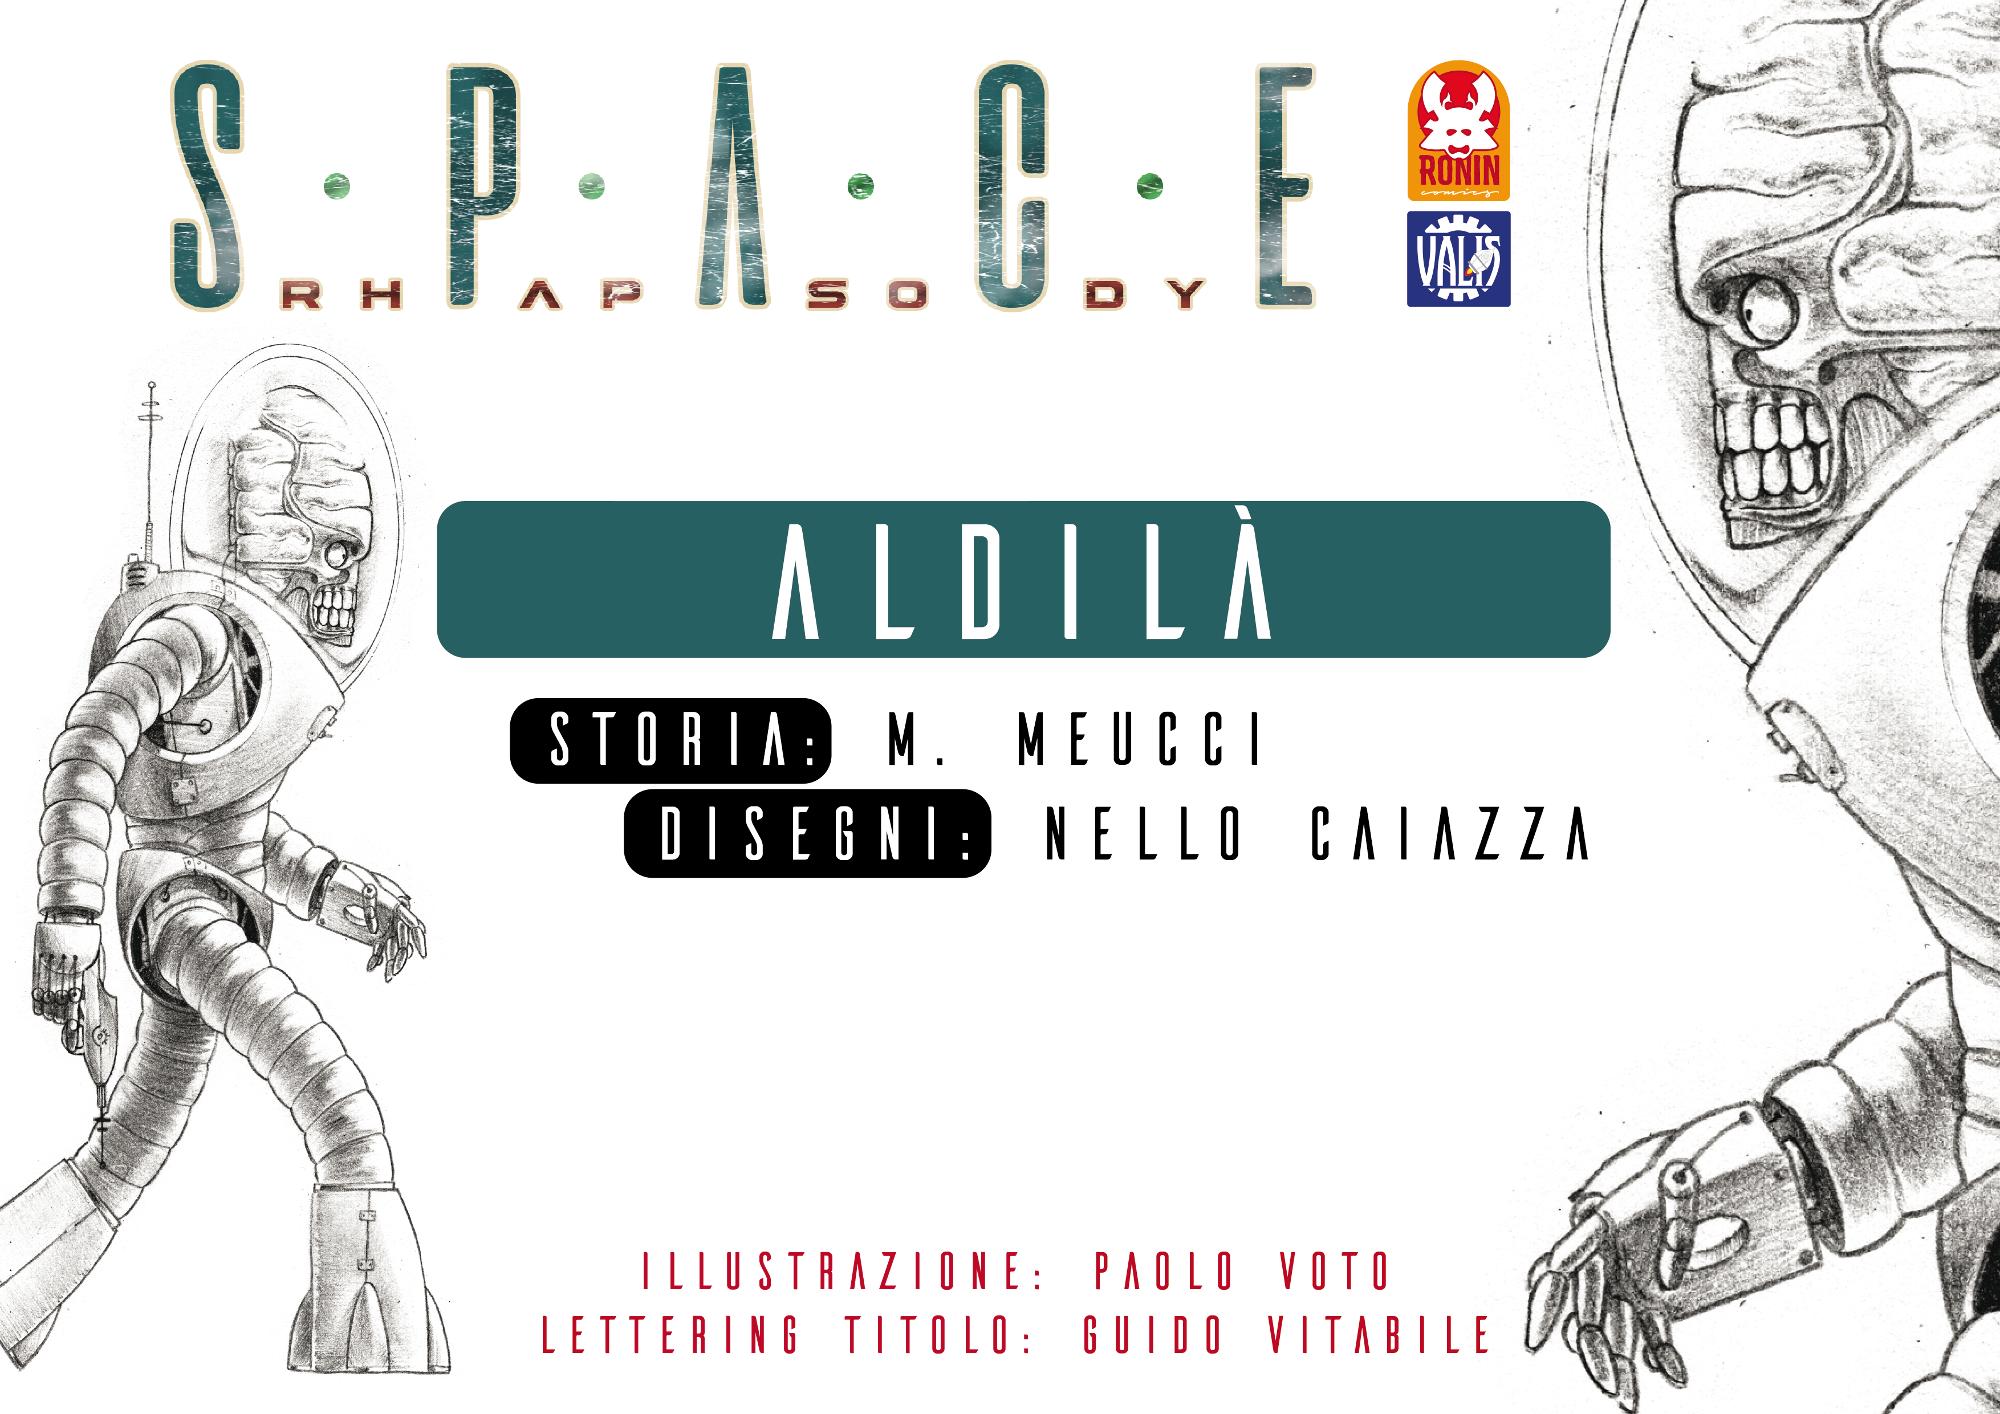 Space Rhapsody #6 – Aldilà 3 - fanzine